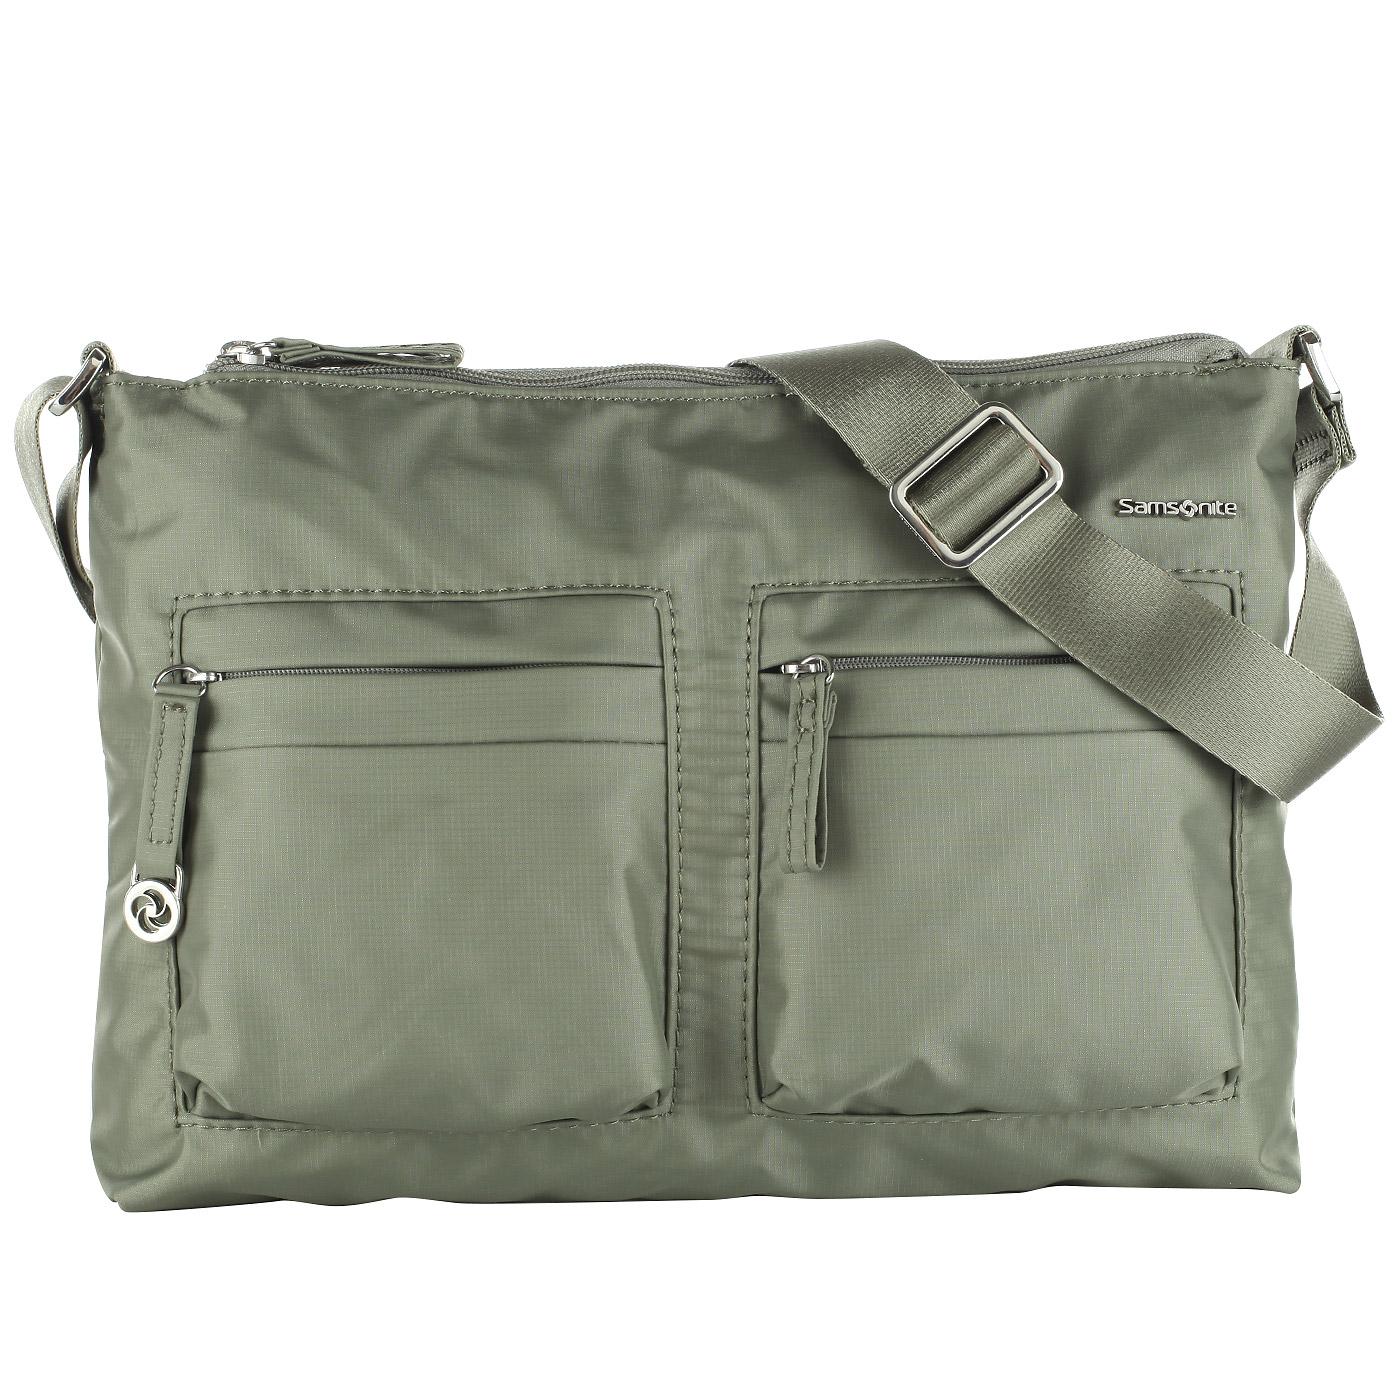 142a58efe43d Женская сумка с плечевым ремнем Samsonite Move 88D04013 ...